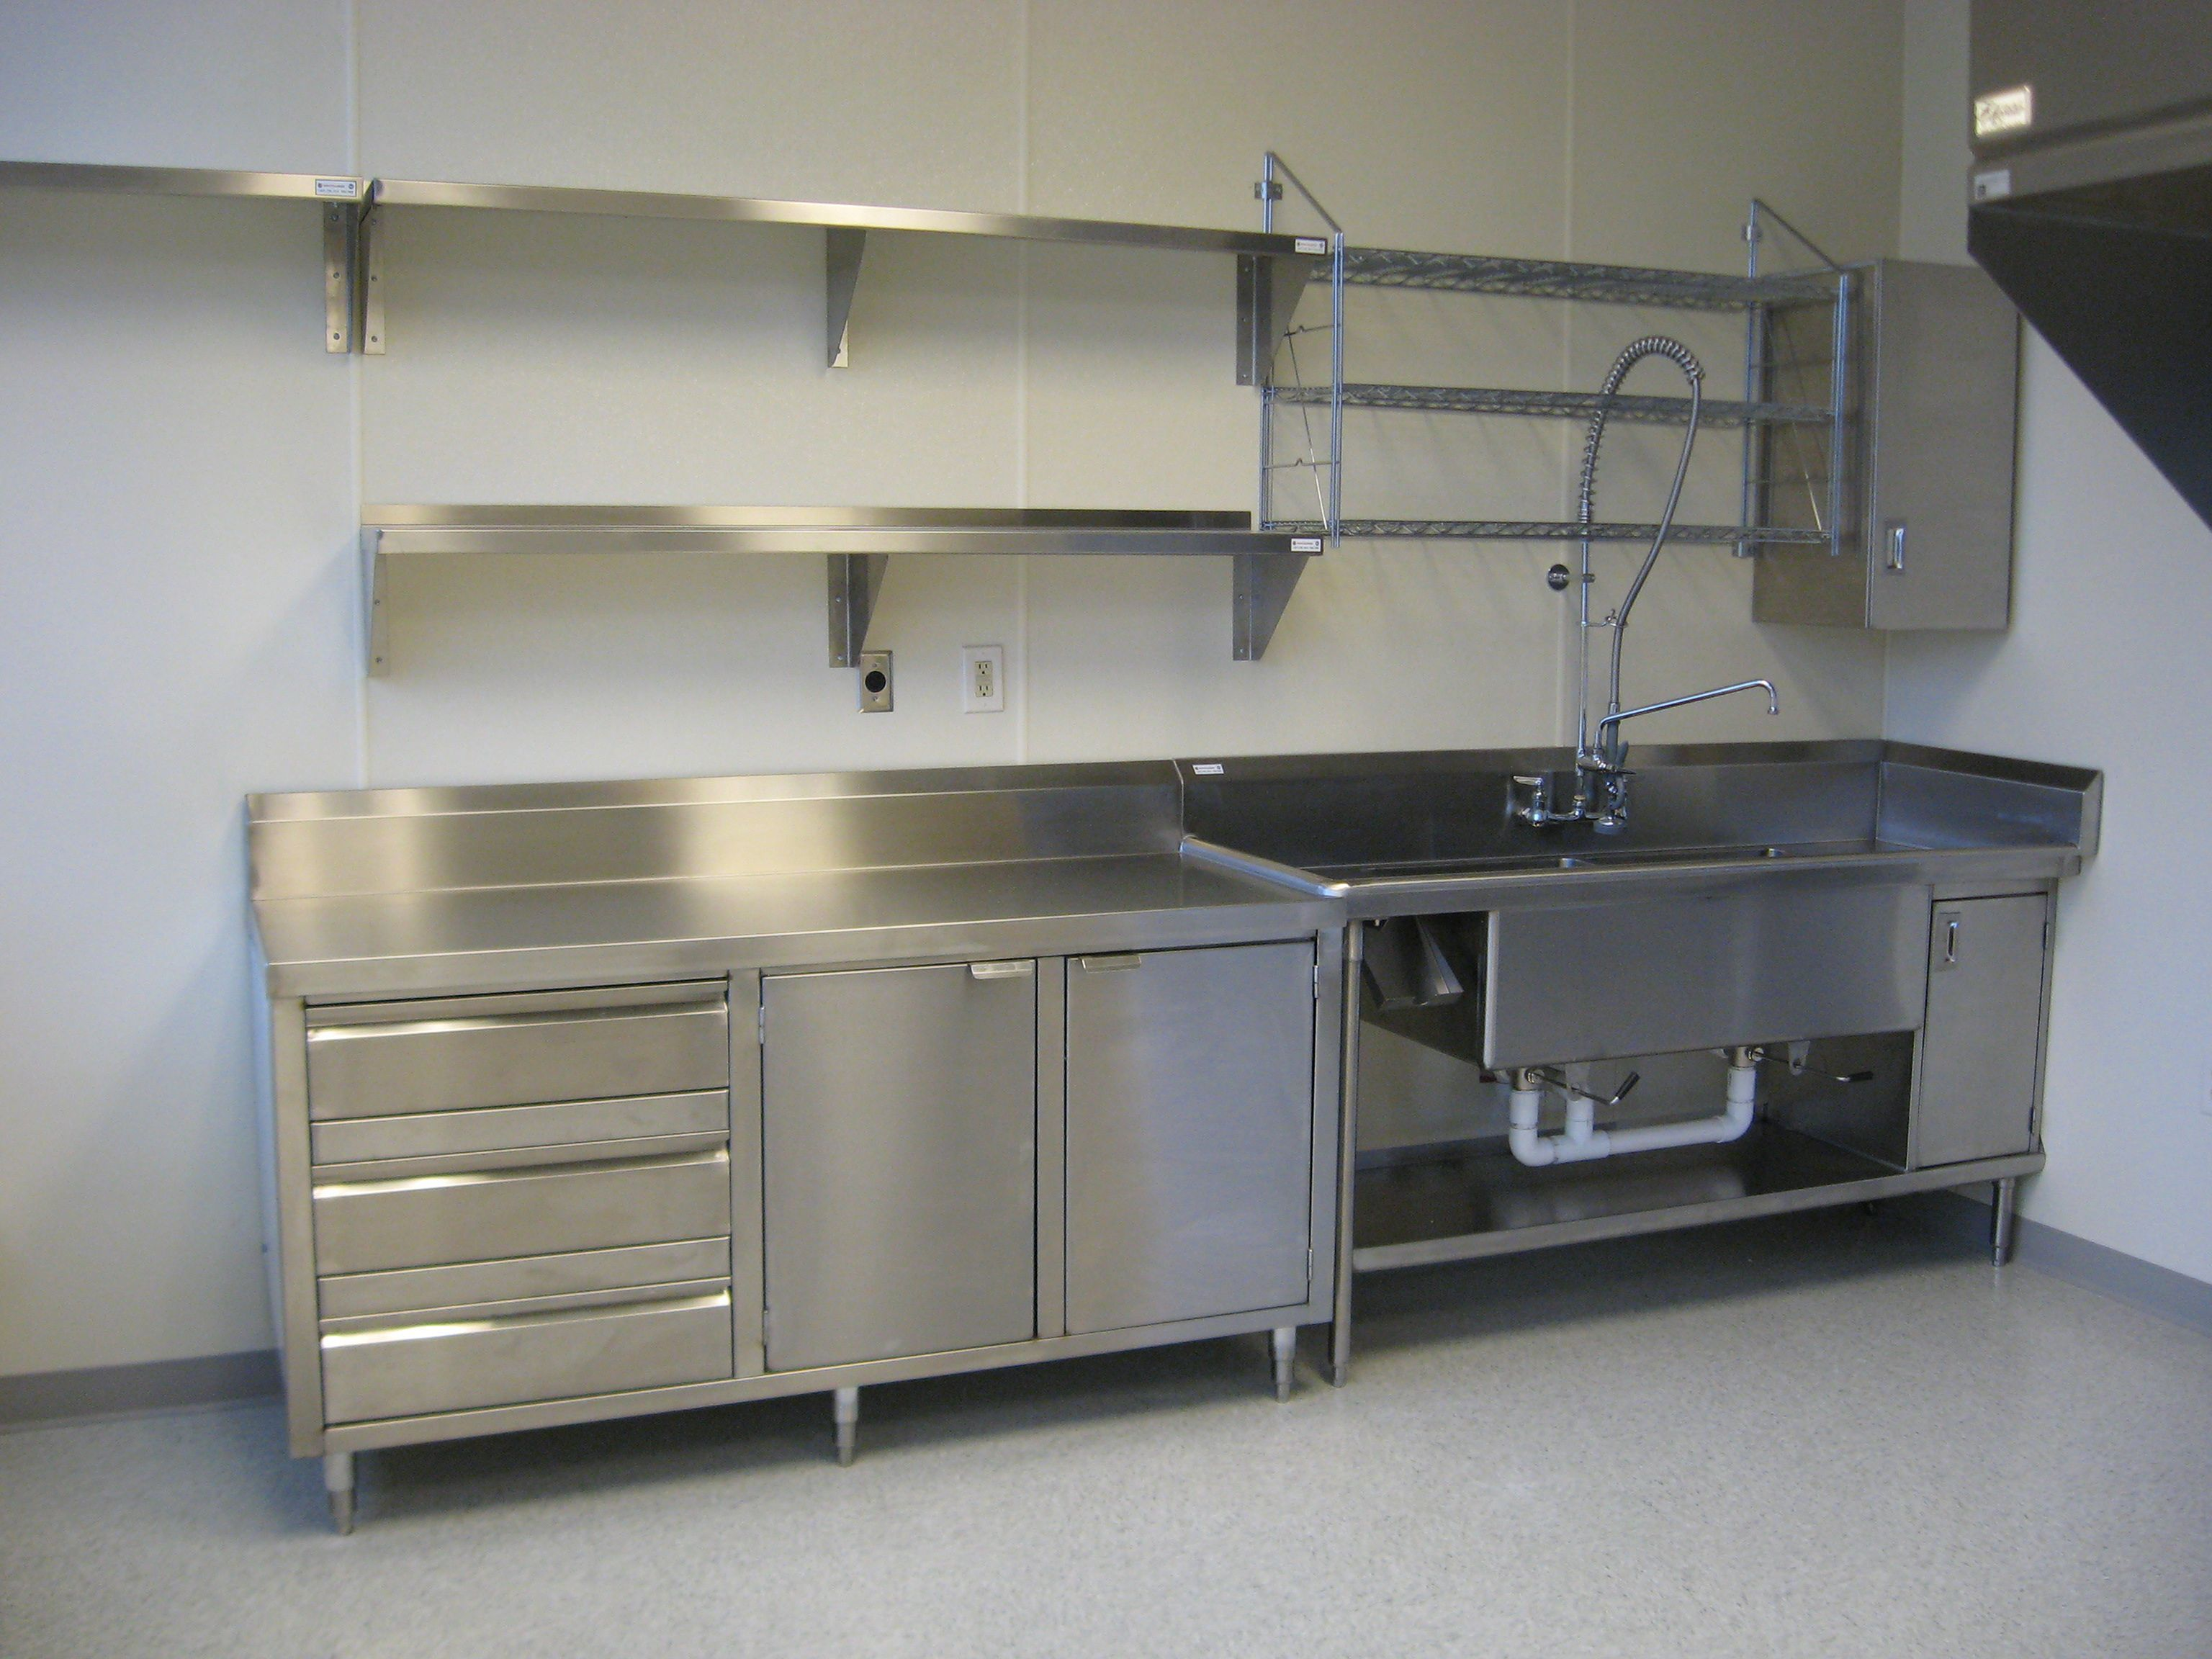 25 Super Modern Stainless Steel Kitchen Cabinet Design For Cozy Kitchen Ideas Commercial Kitchen Design Industrial Kitchen Design Kitchen Layout Stainless steel kitchen units